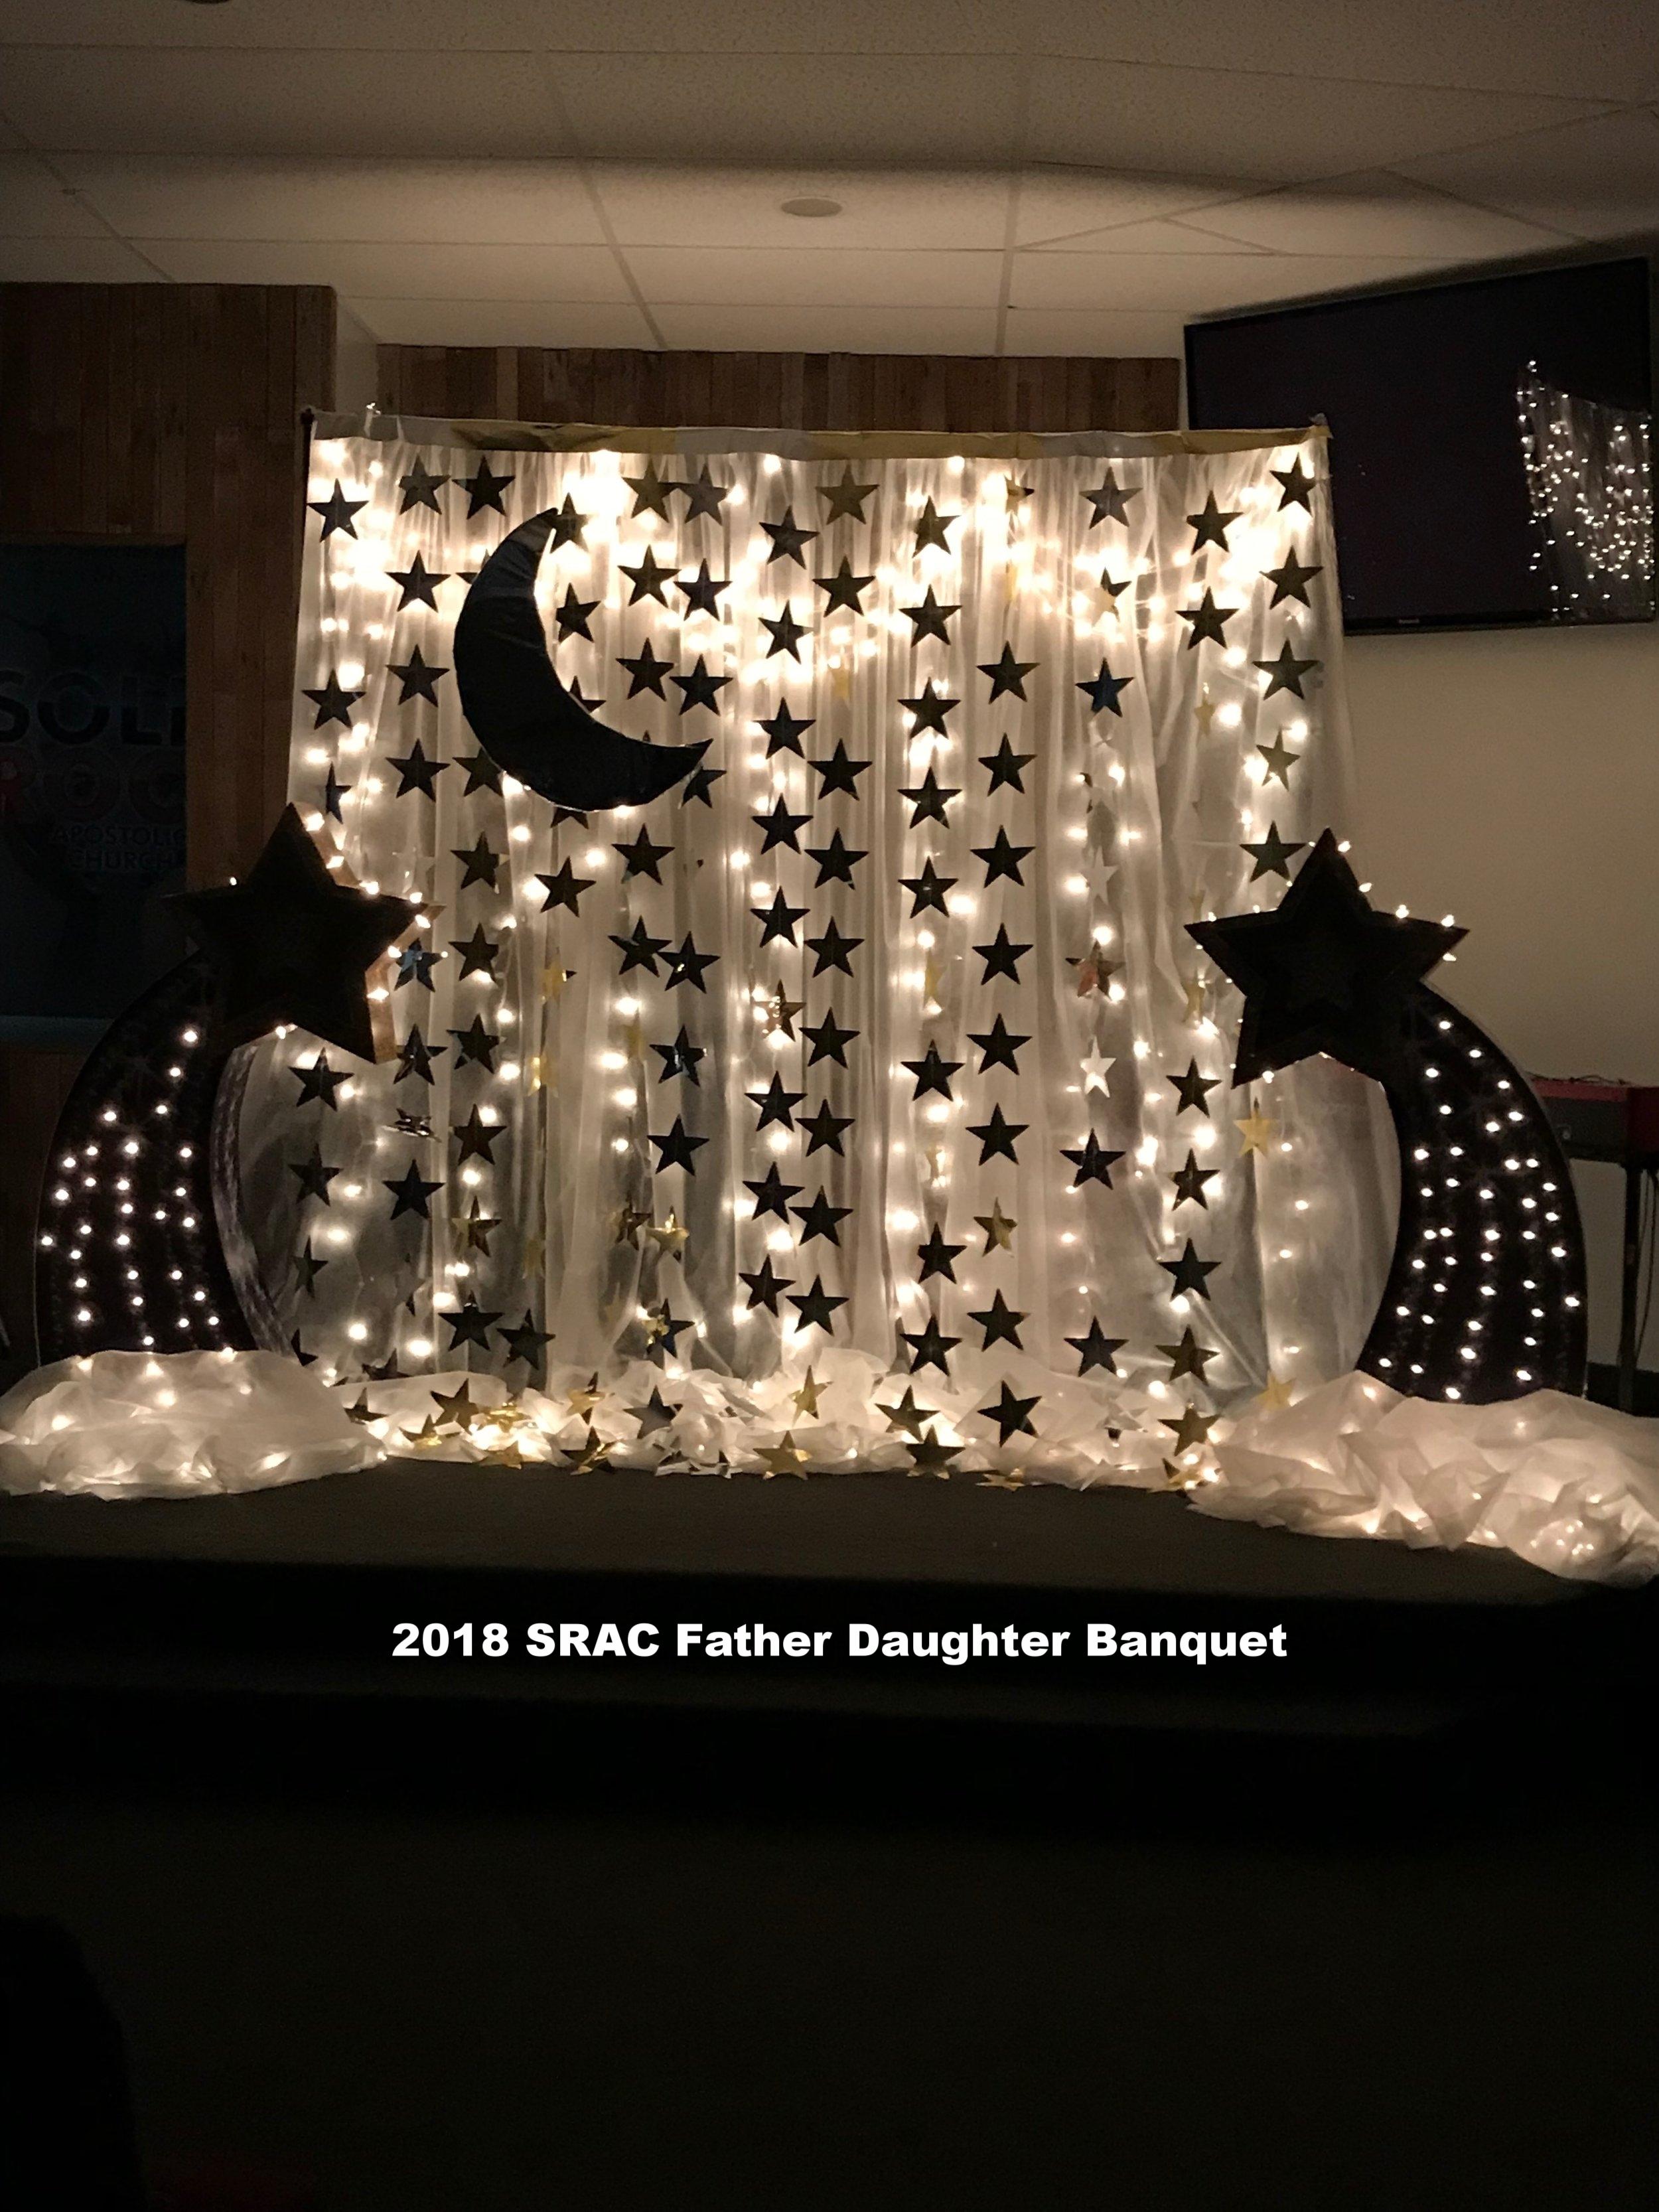 2018 SRAC Father Daughter Banquet